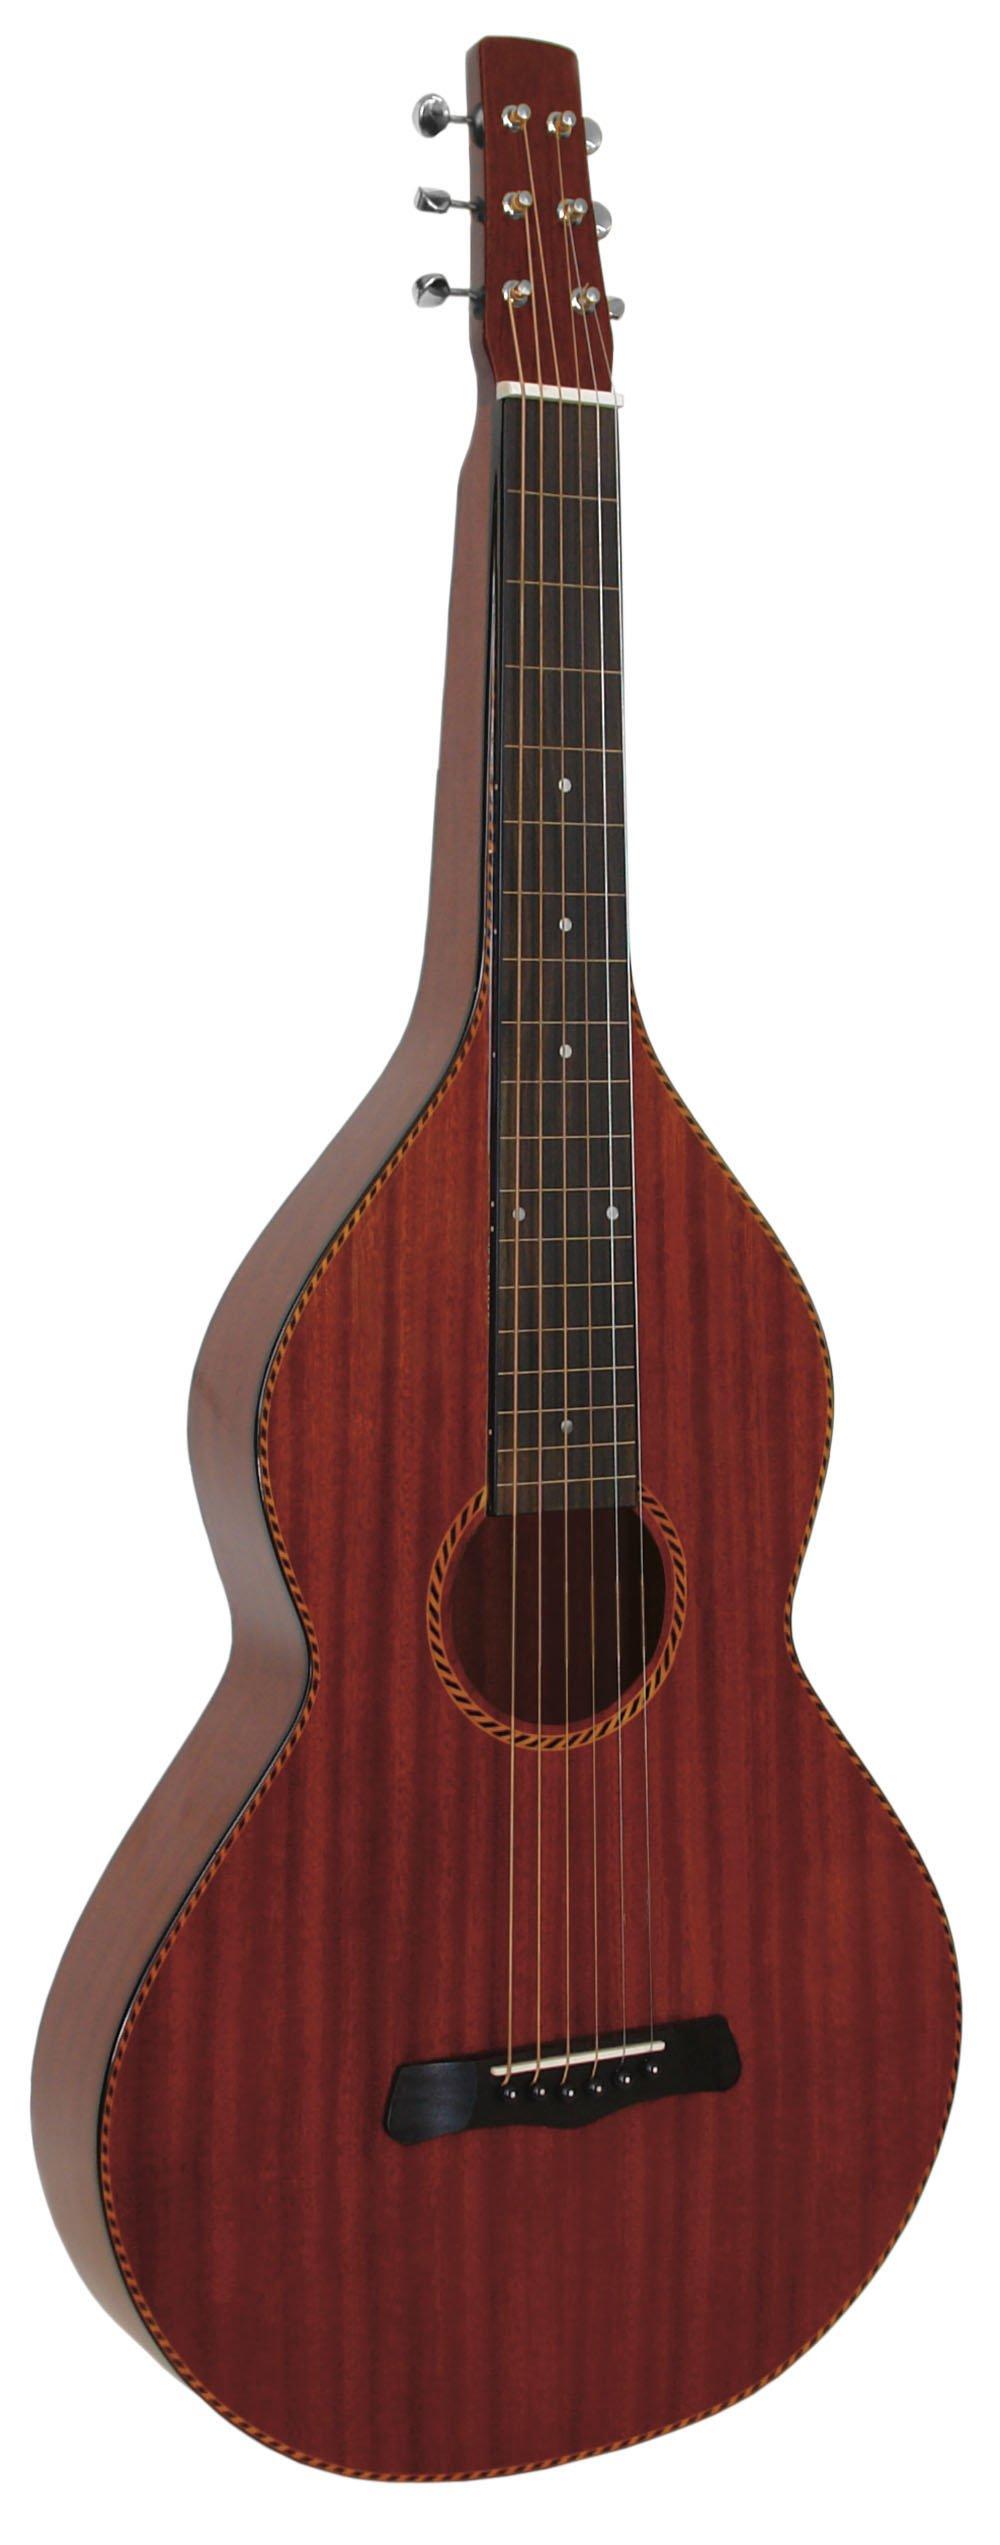 Gold Tone LM Weissenborn Style Hawaiian Steel Guitar (High Gloss Mahogany)